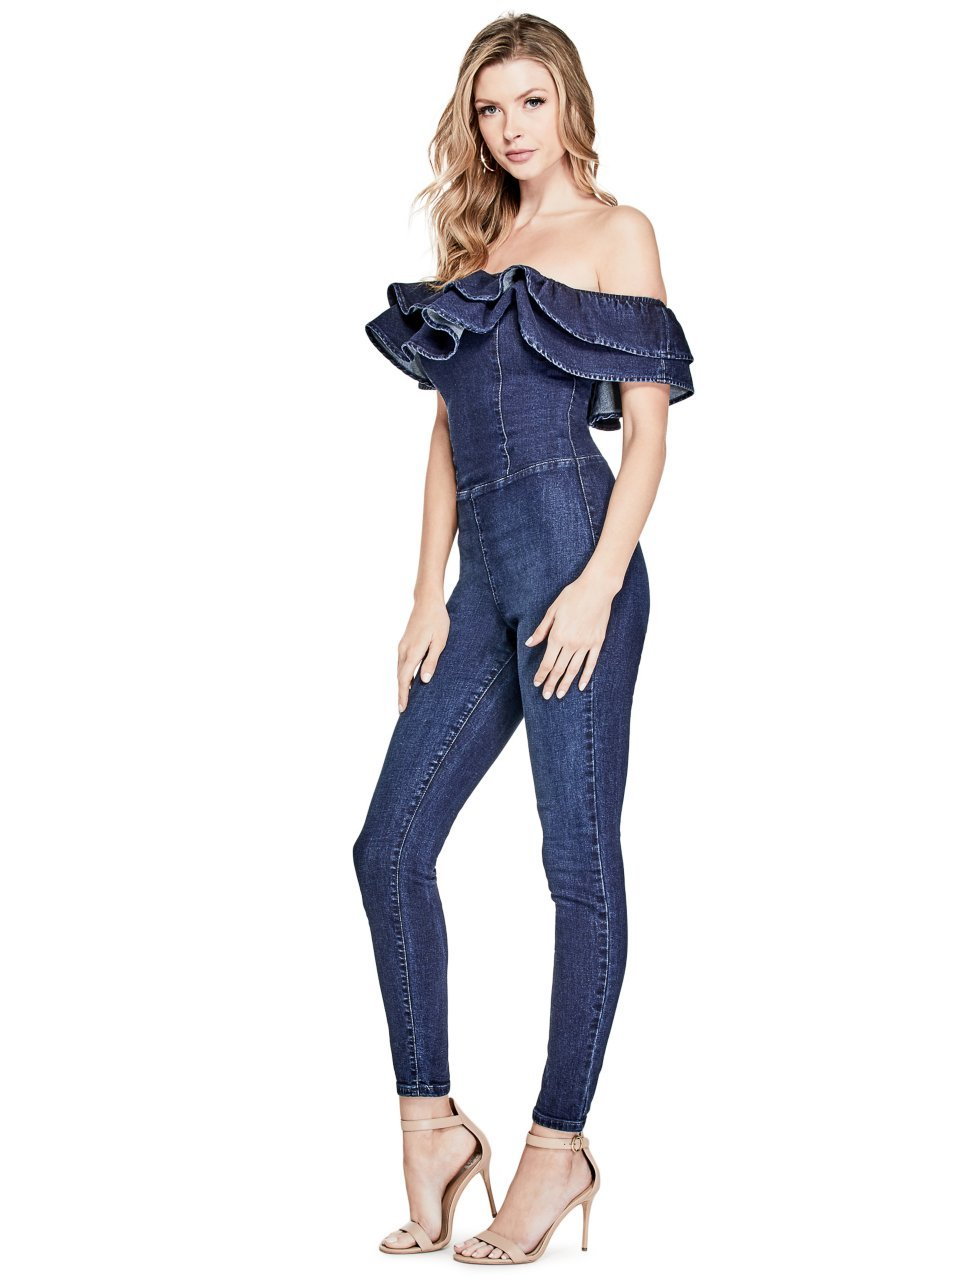 GUESS Women's Ruffle Jumpsuit, Dark Wash, XS